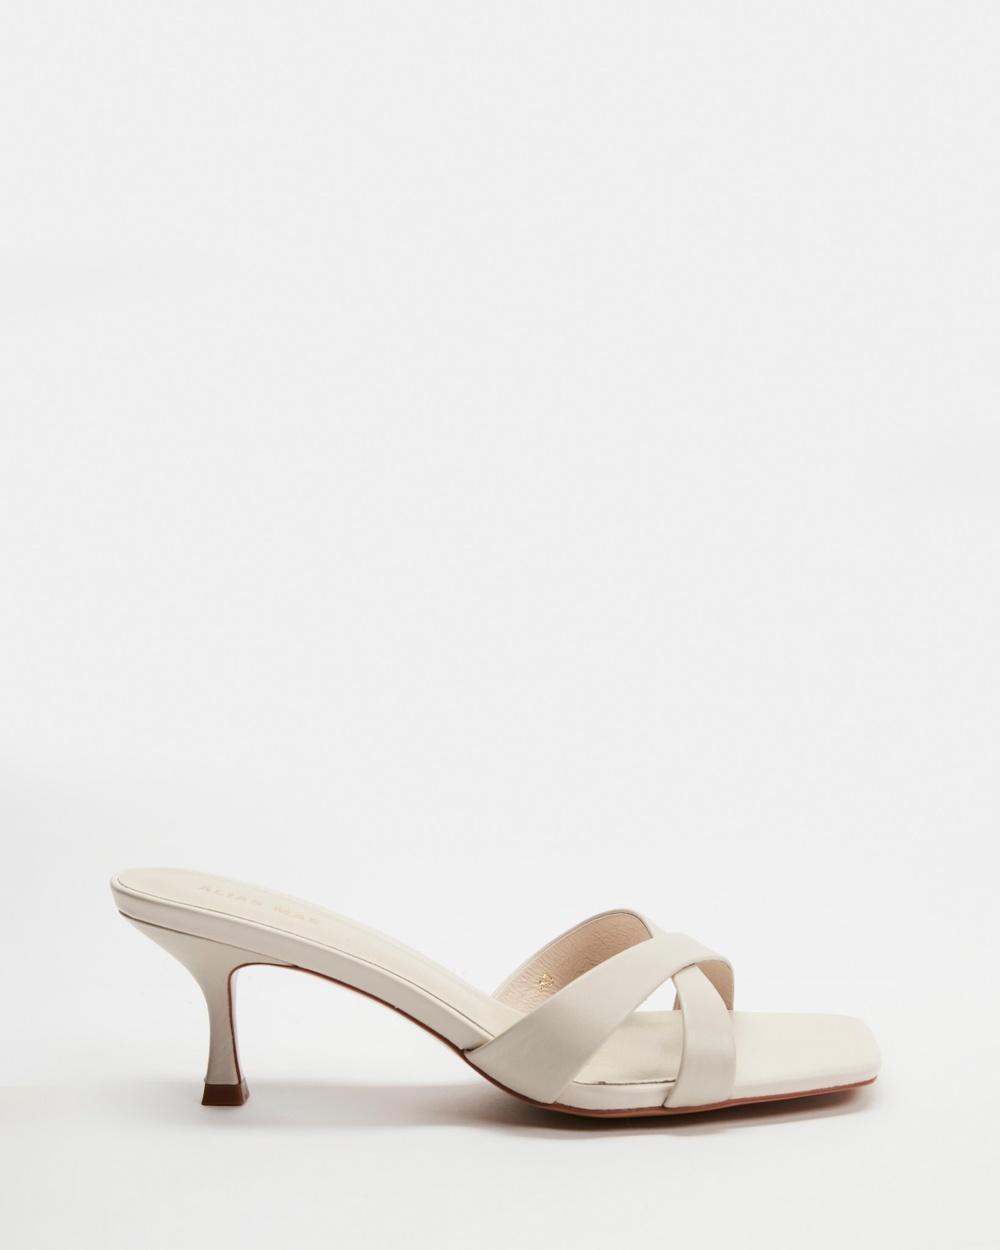 Alias Mae Banksy Mid-low heels Bone Leather